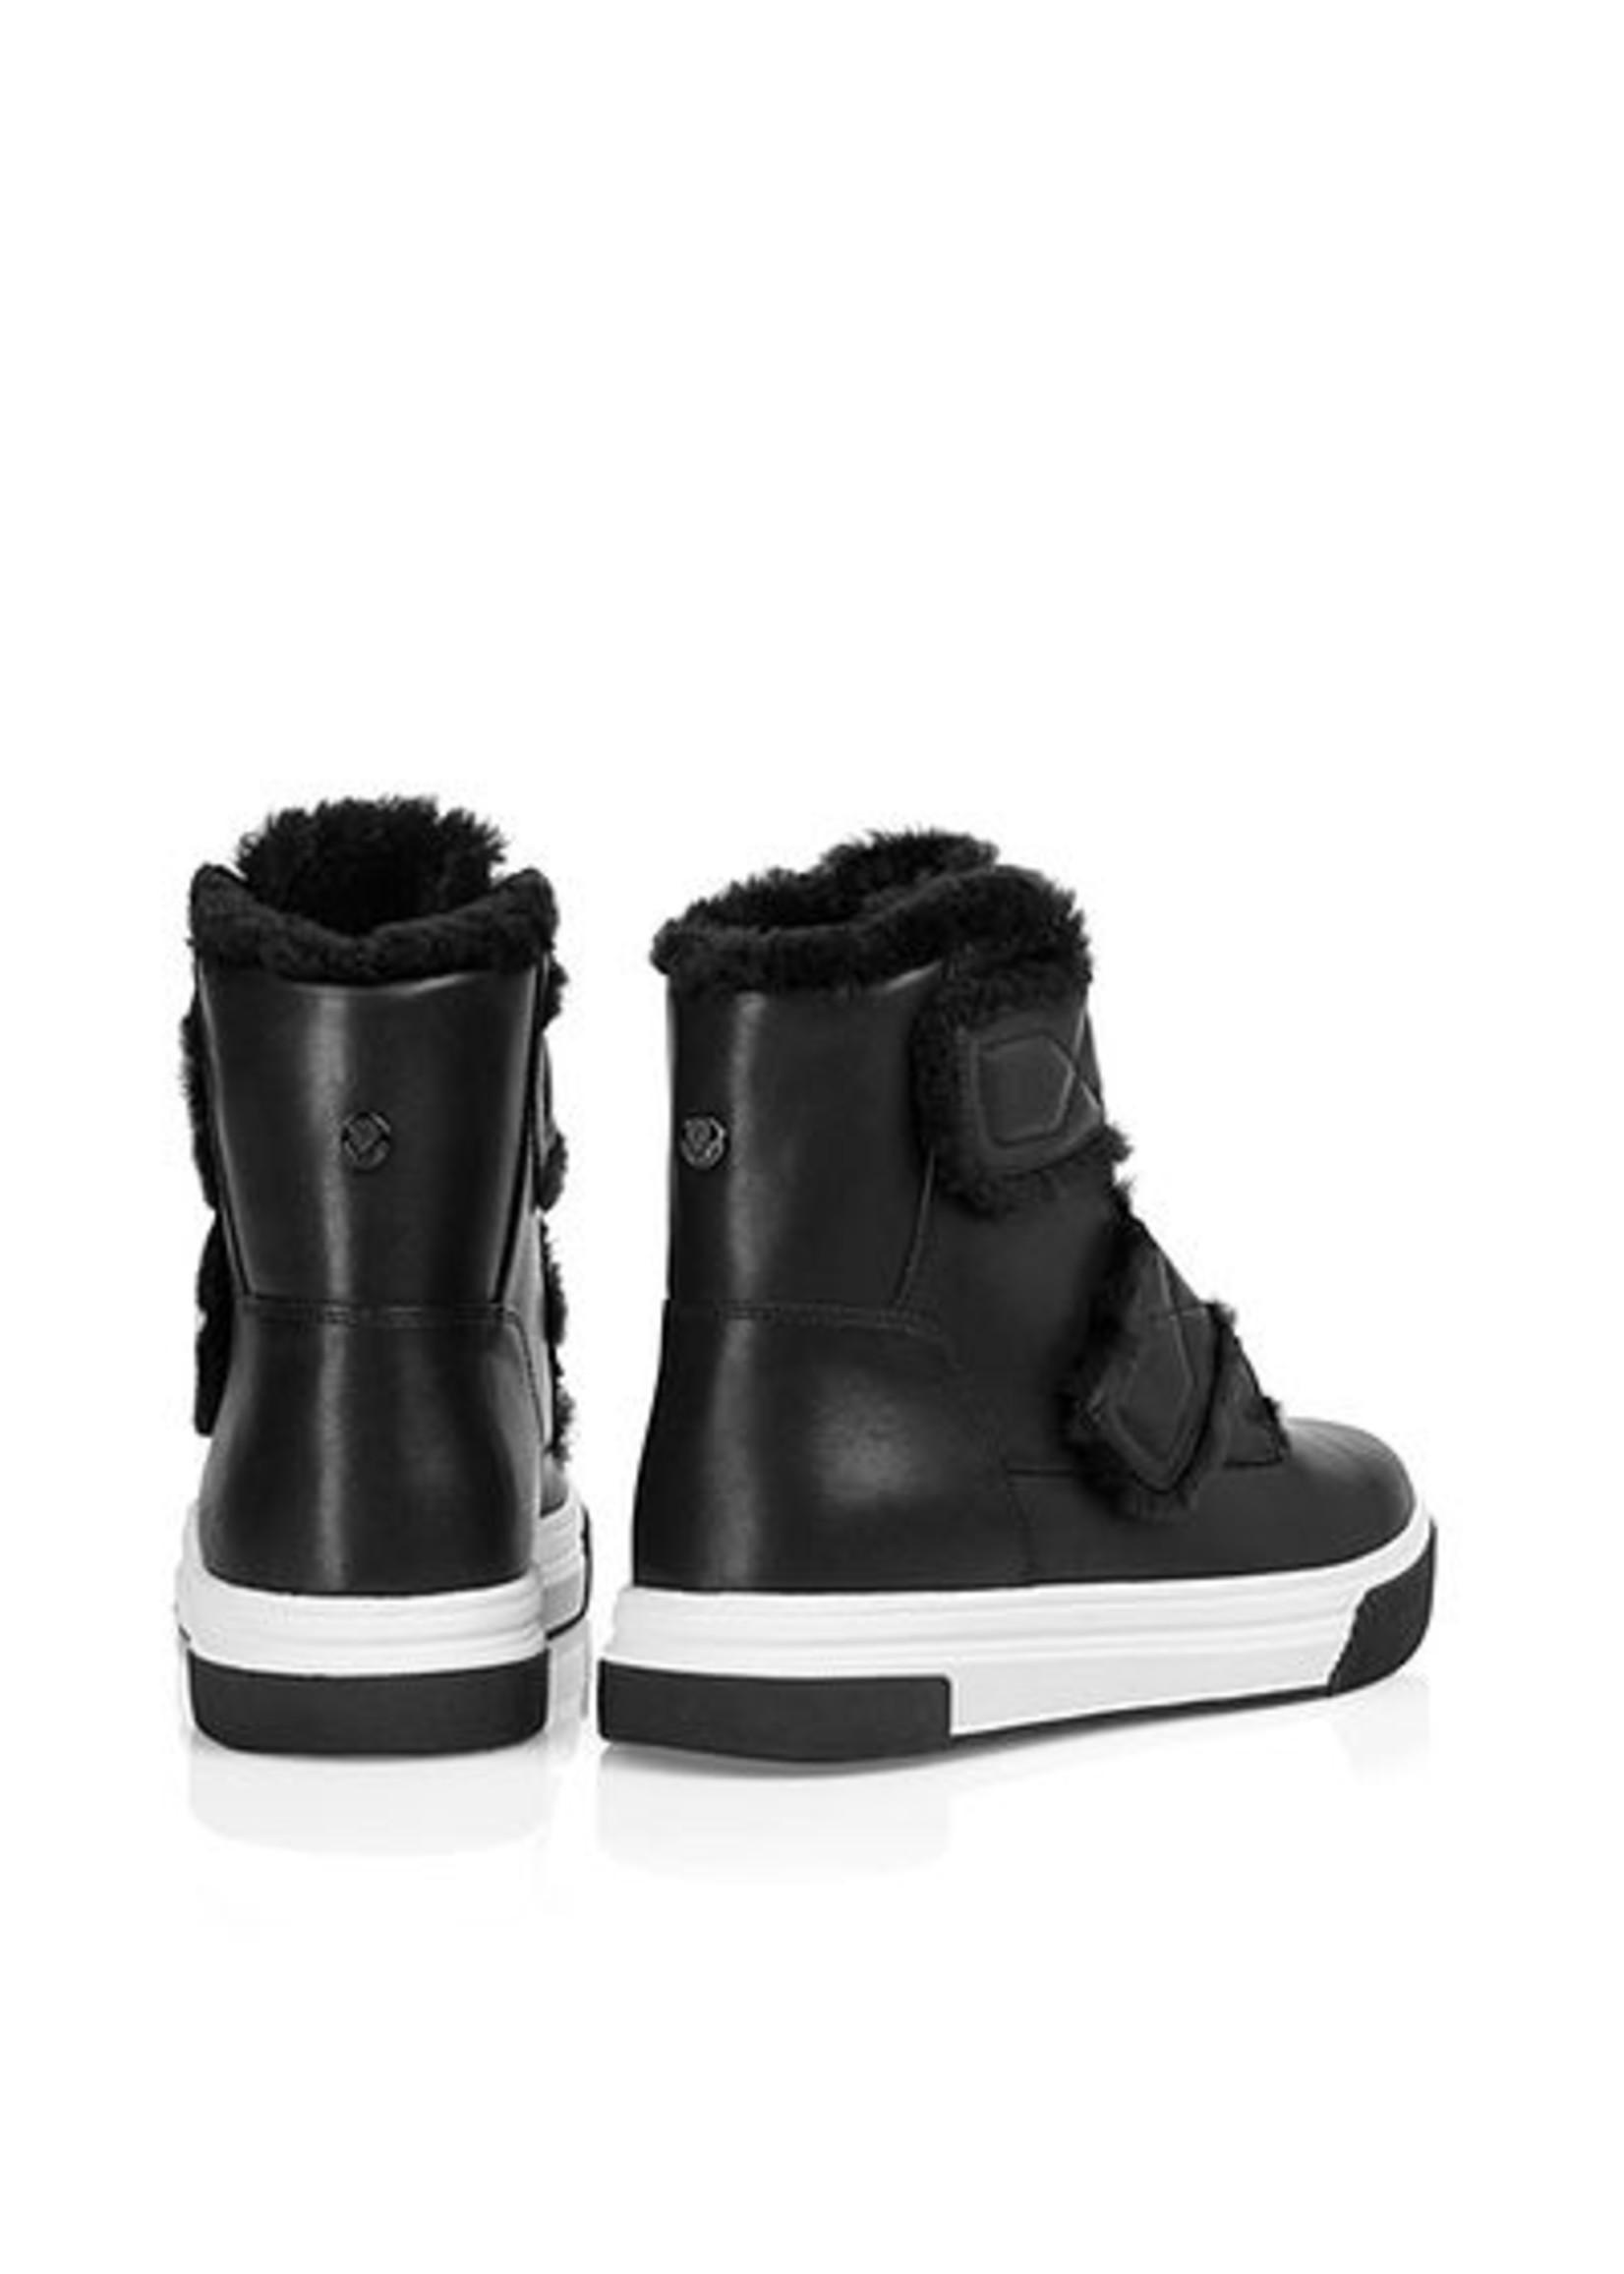 Marccain Bags & Shoes Sneaker RB SH.08 L01 black